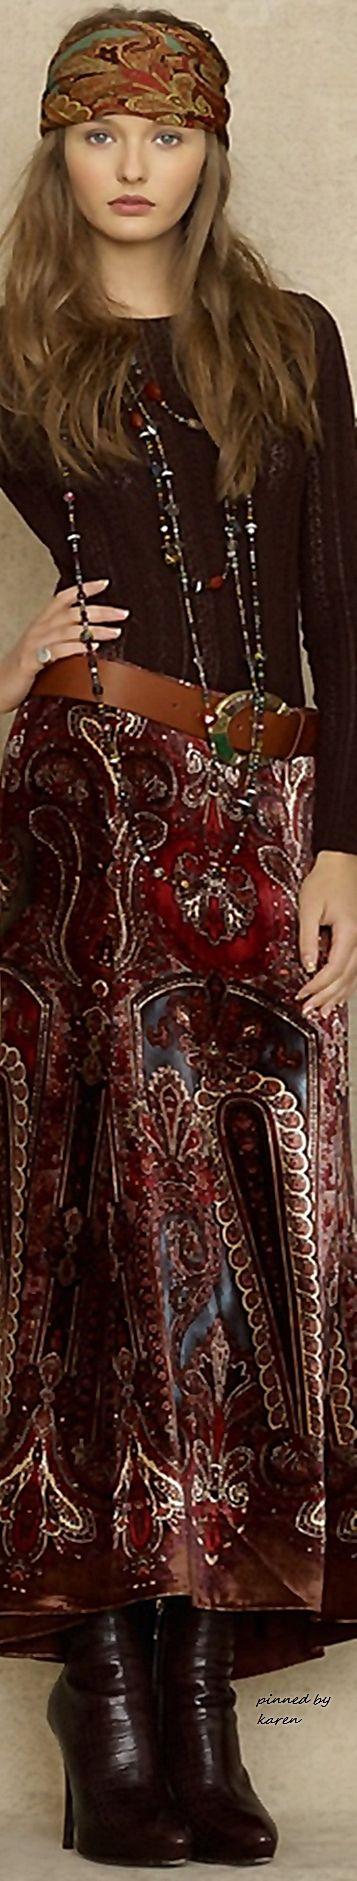 Ralph Lauren Pre Fall 2015 • ≫∙∙☮ Bohème Babe ☮∙∙≪• ❤️ Babz ✿ιиѕριяαтισи❀ #abbigliamento #bohojewelry #boho